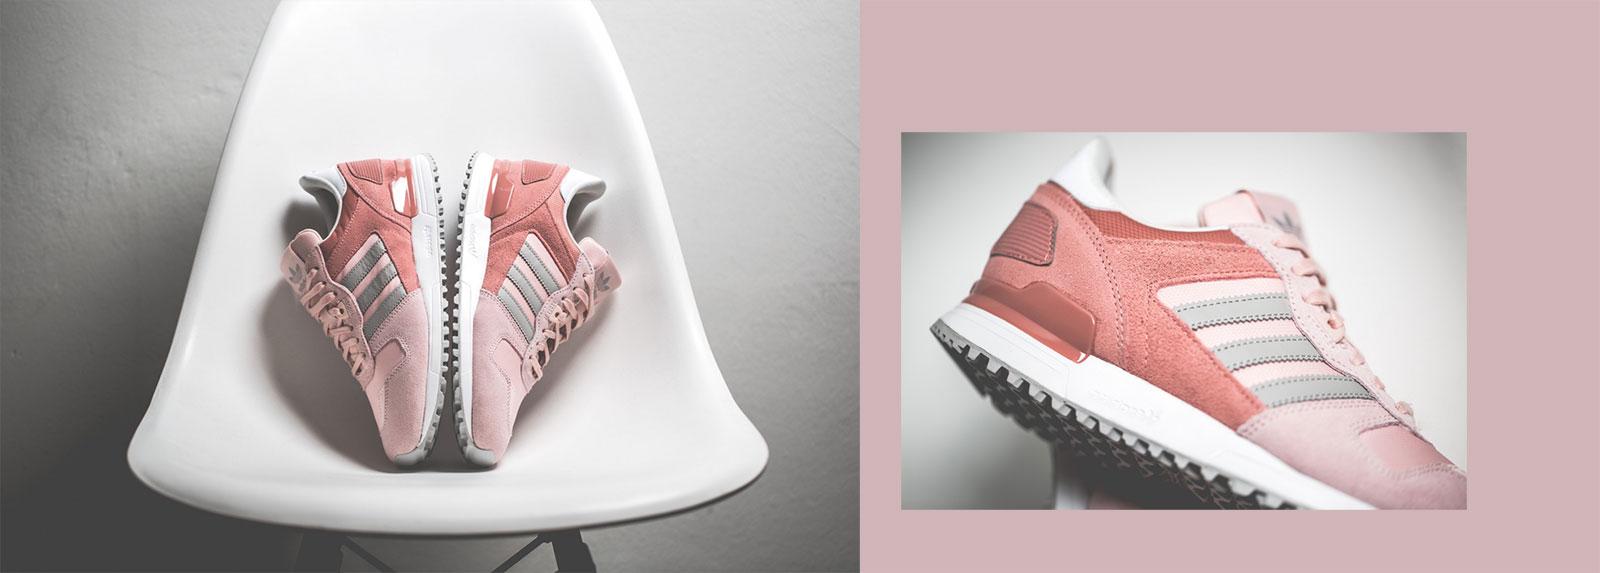 zx 700 Pink